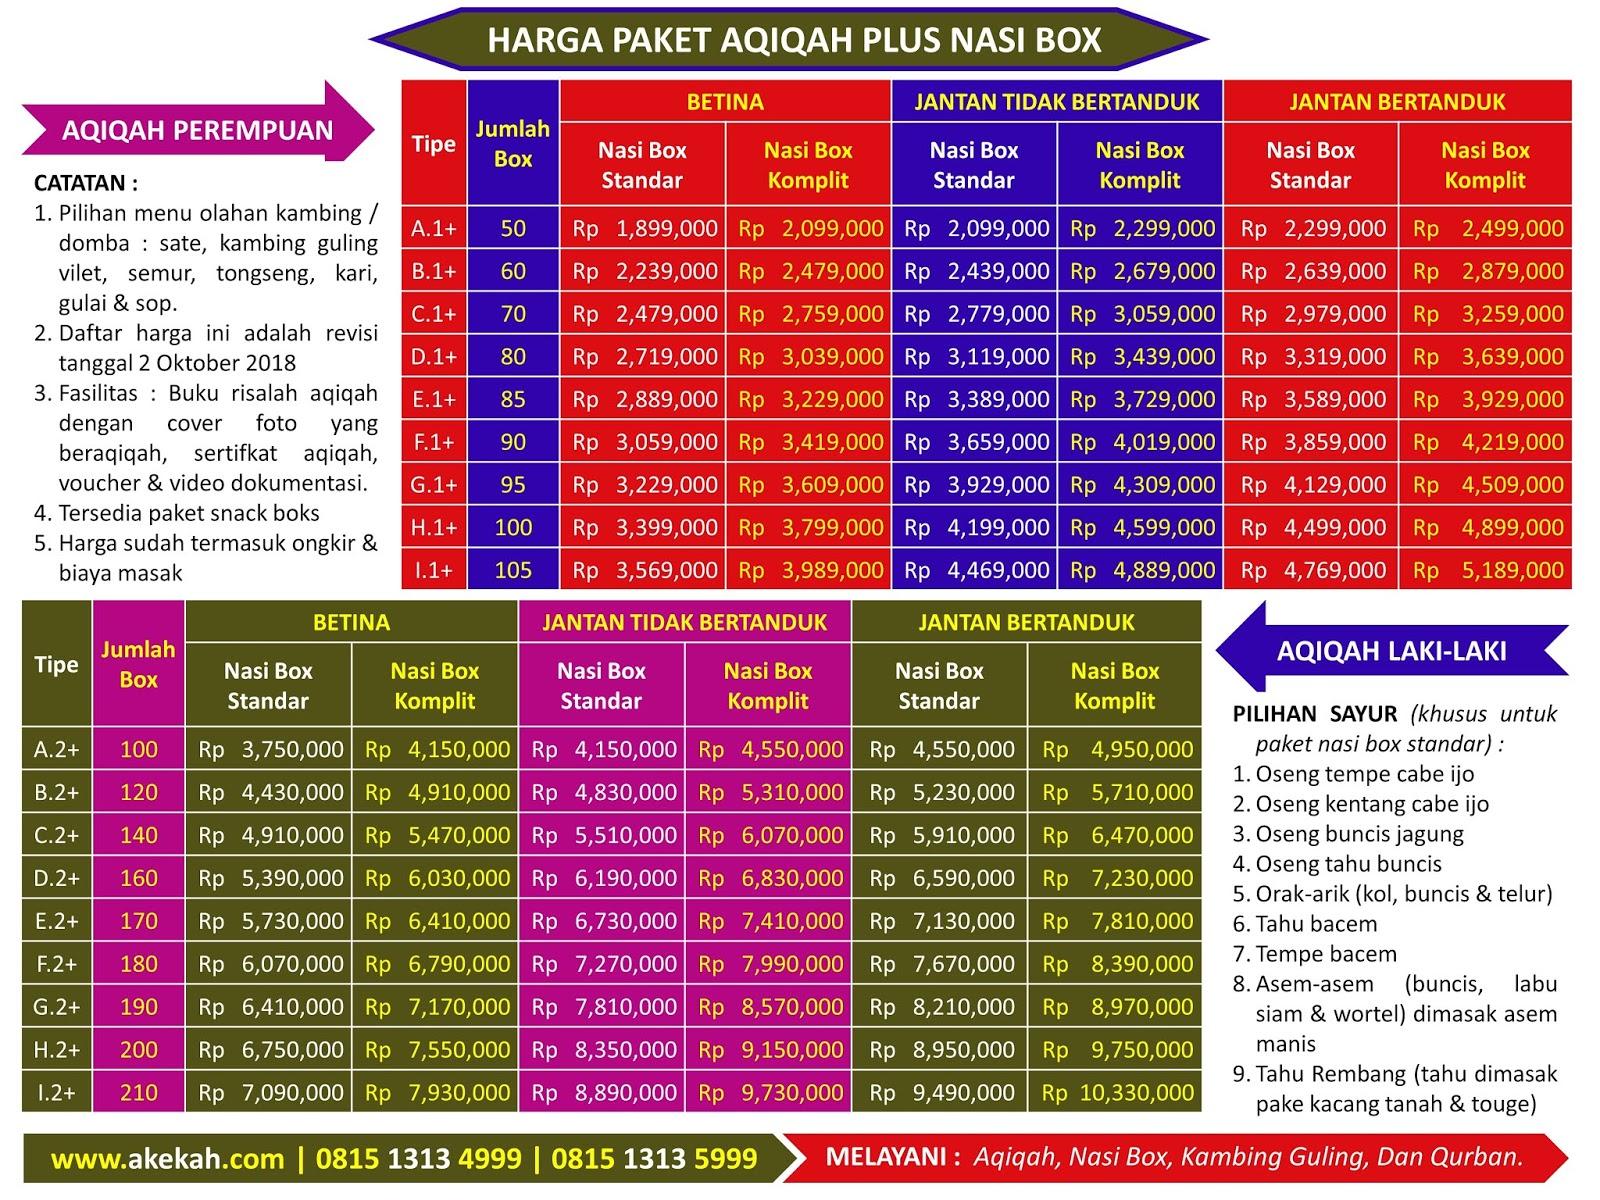 Jasa Aqiqah & Catering Kabupaten Bogor